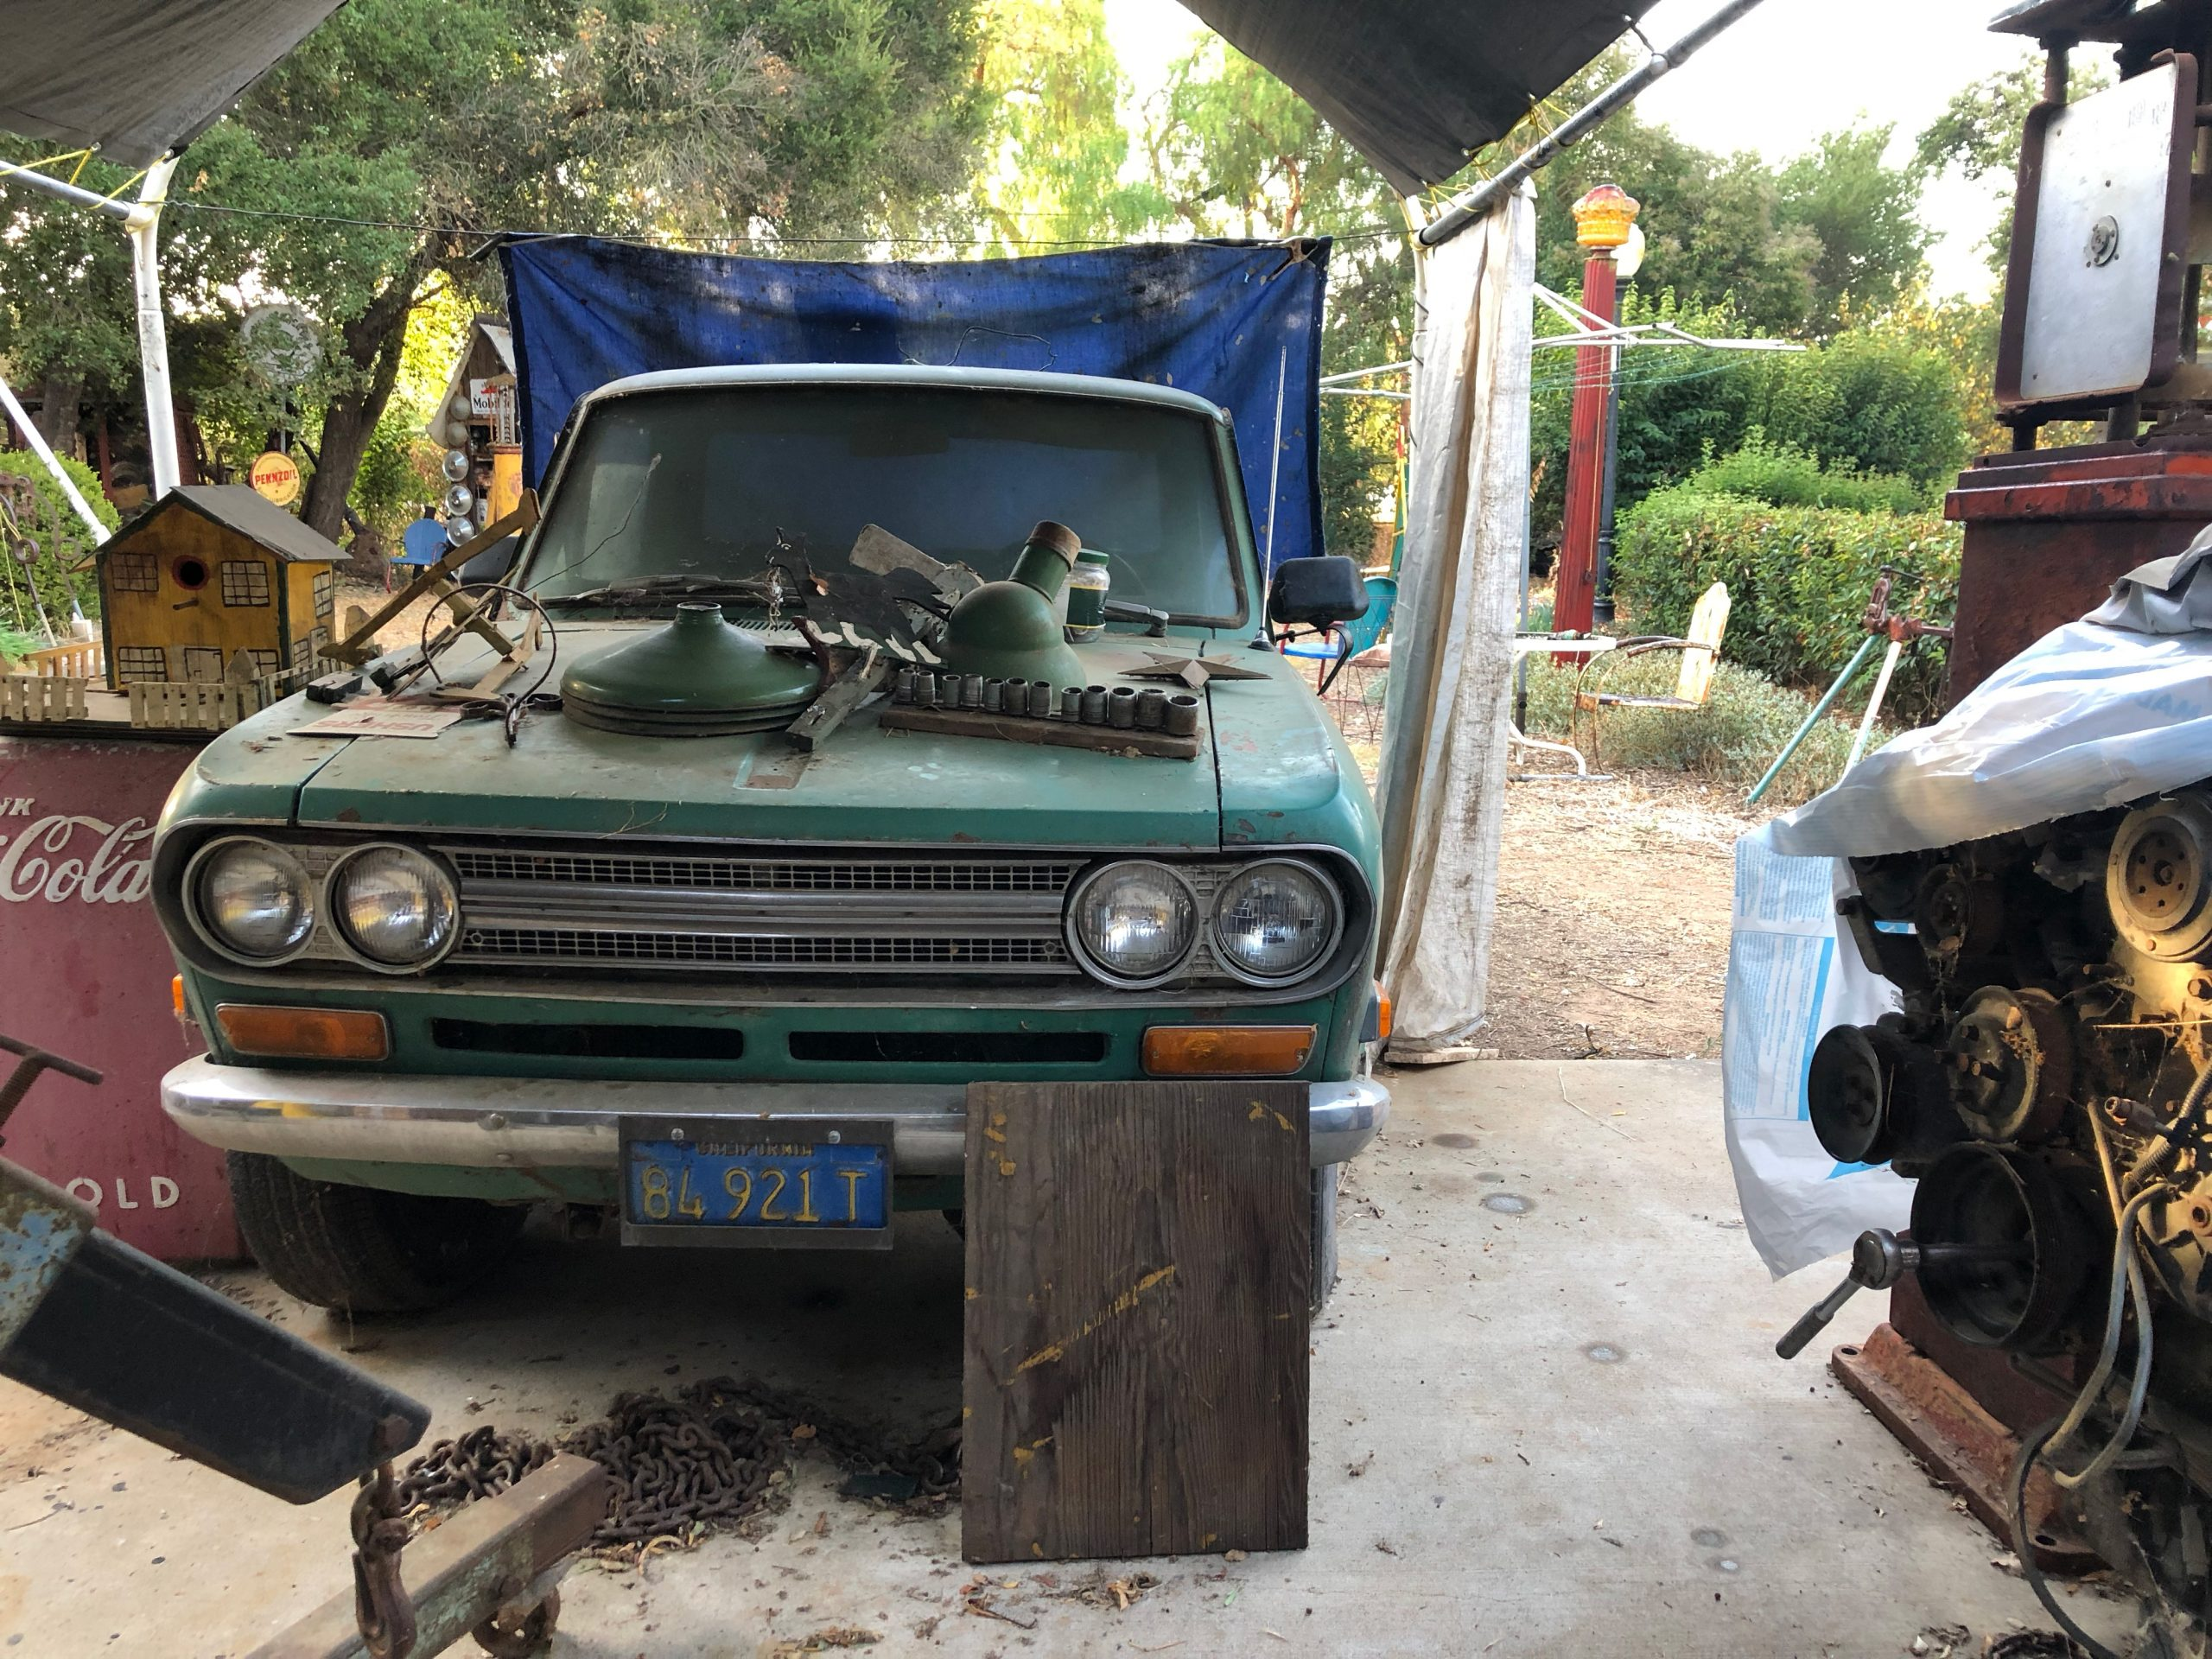 vintage car engine and automobilia